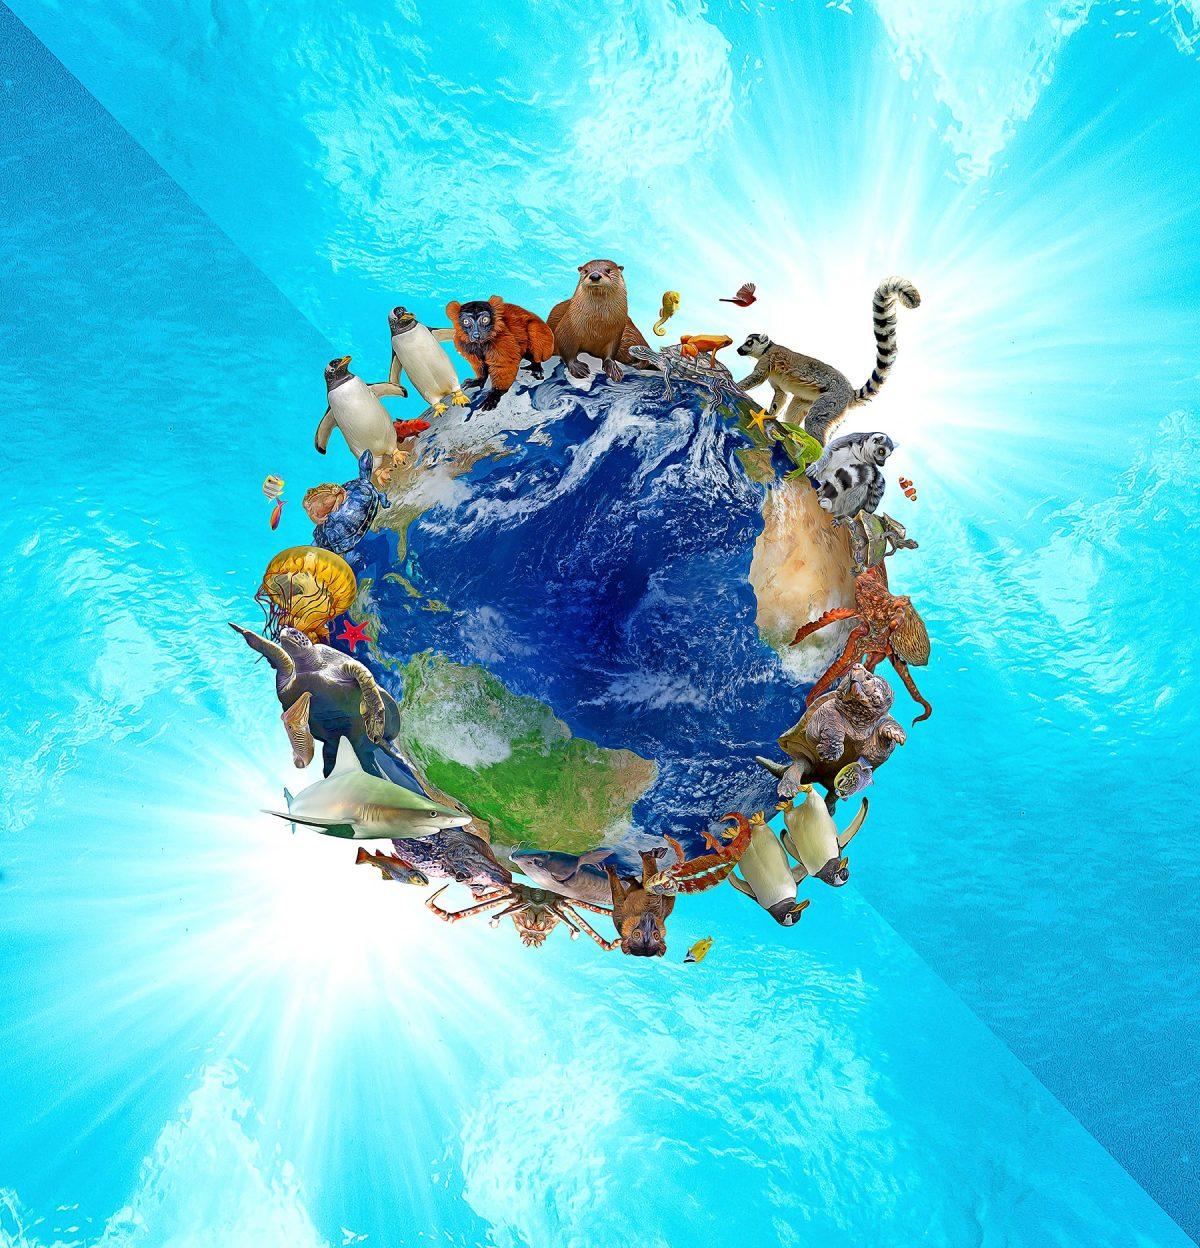 Global Passport logo featuring animals surrounding a globe